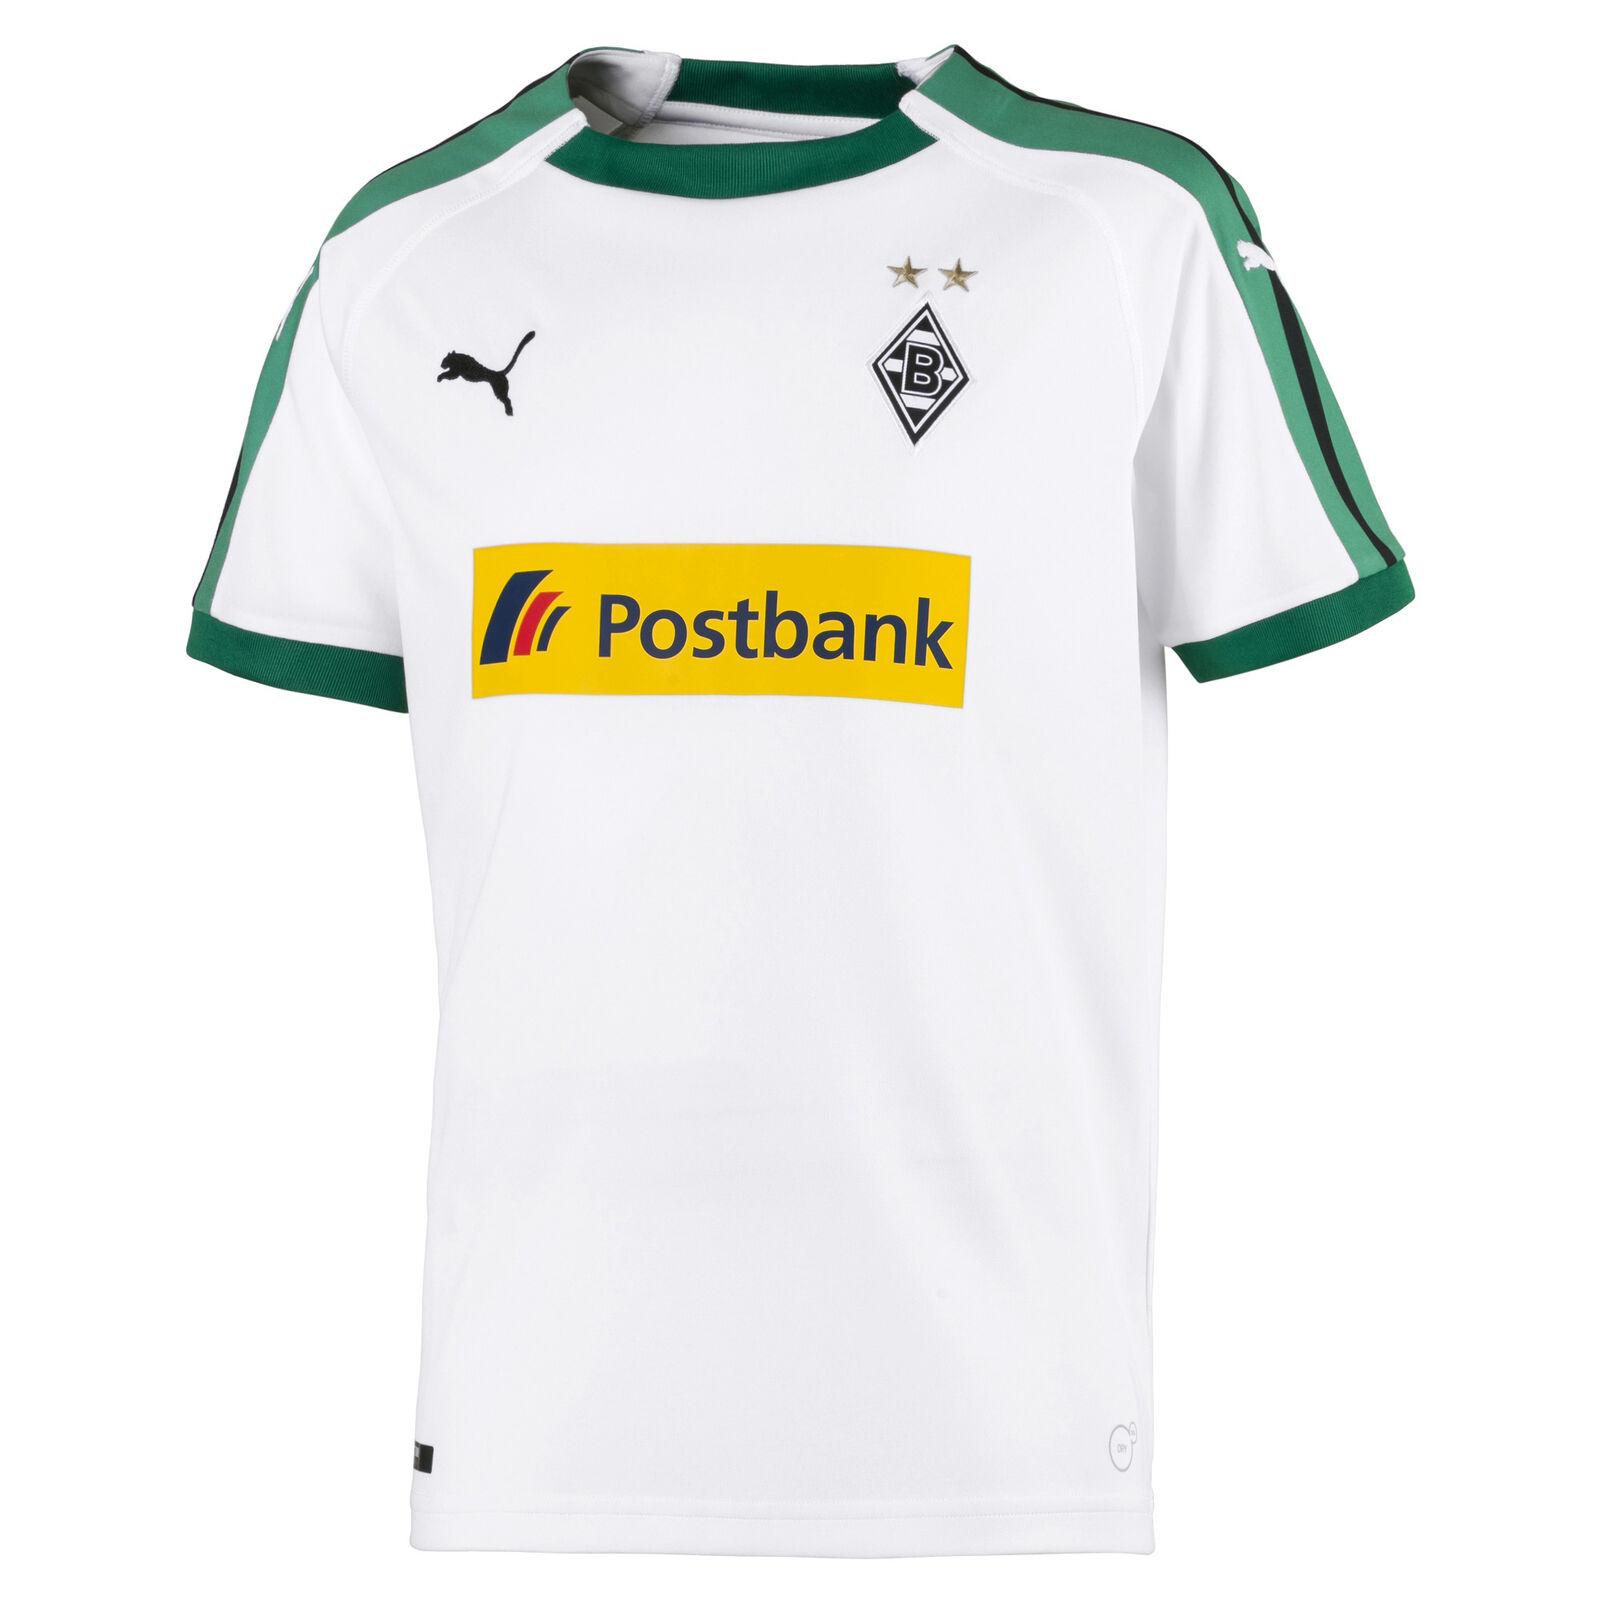 Puma Borussia Mönchengladbach Kinder Heim 18/19 Trikot Home Shirt 18/19 Heim - 753453-01 8bb323